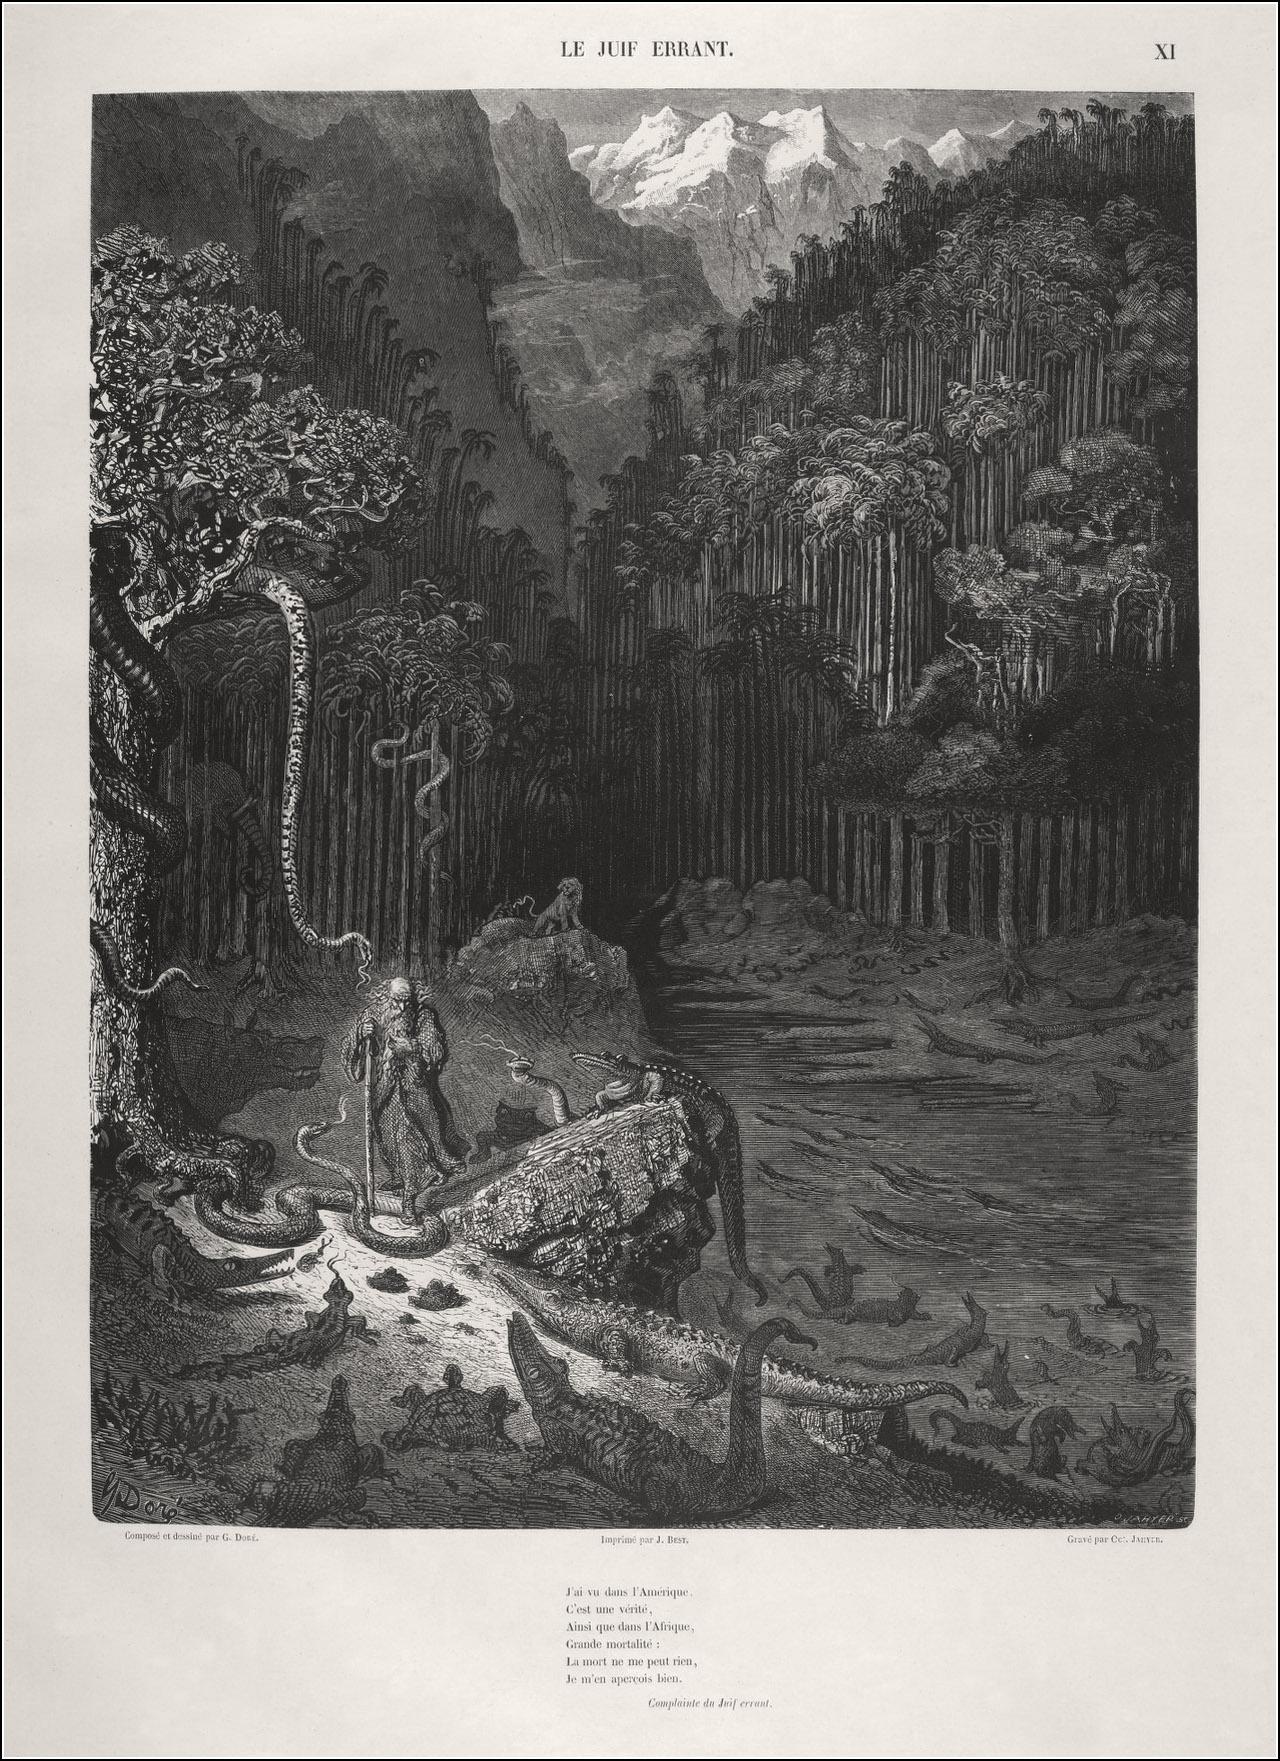 Gustave Doré, La légende du Juif errant